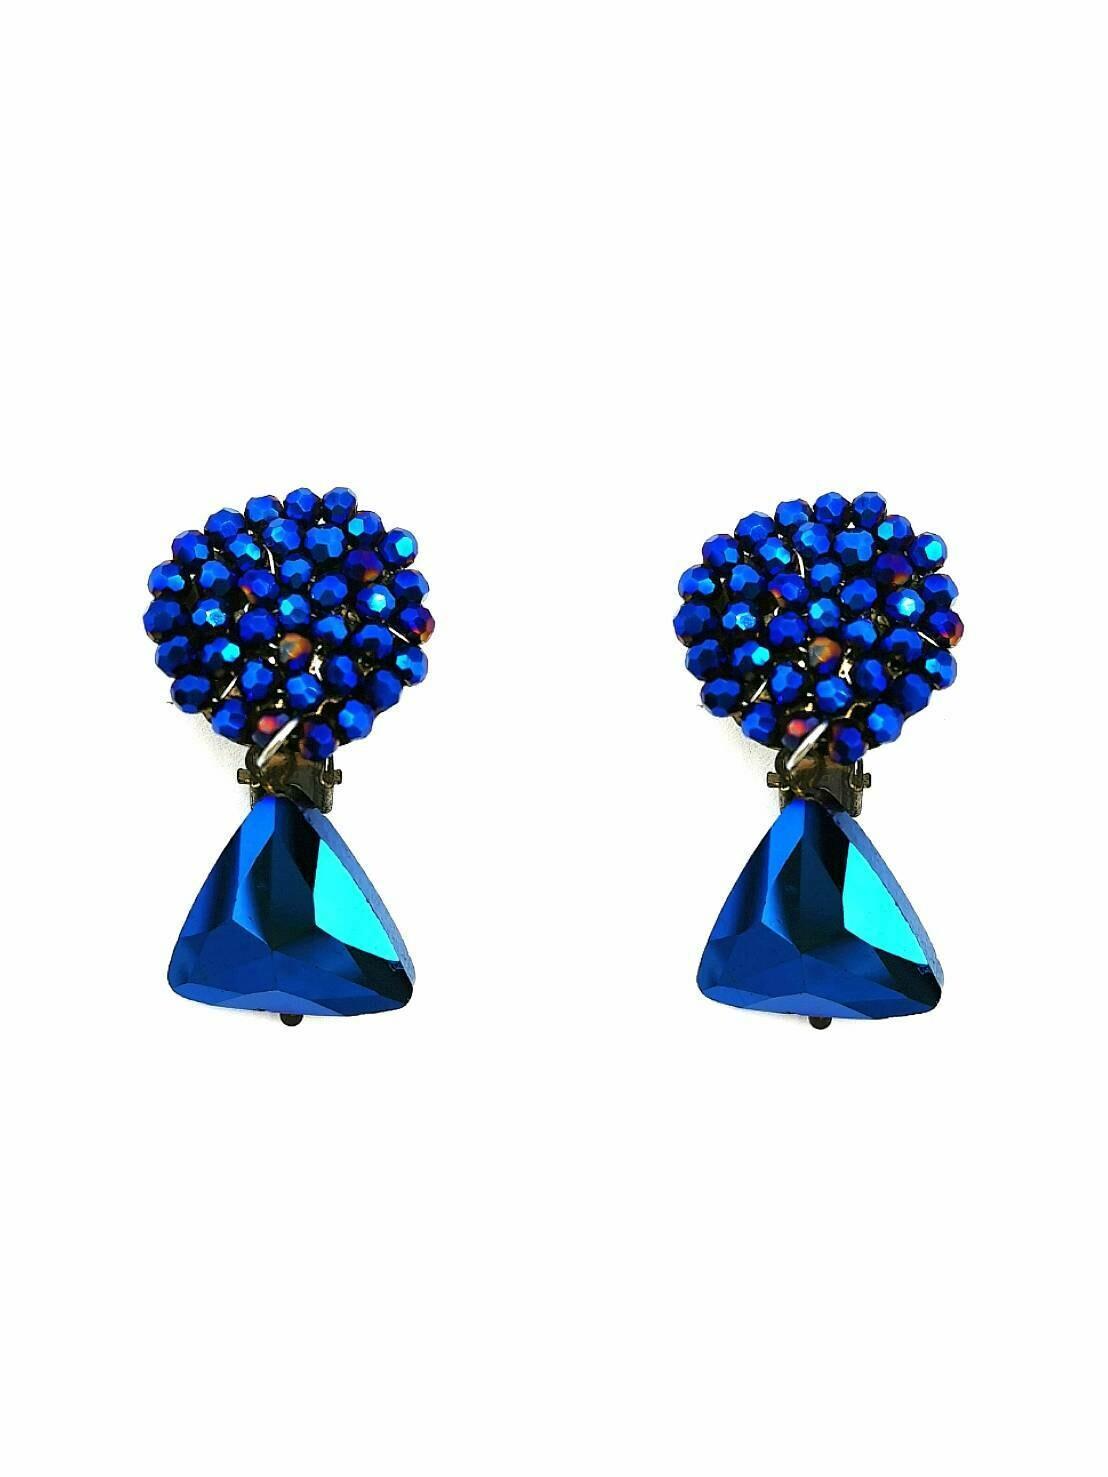 Peacocks On Parade Earrings